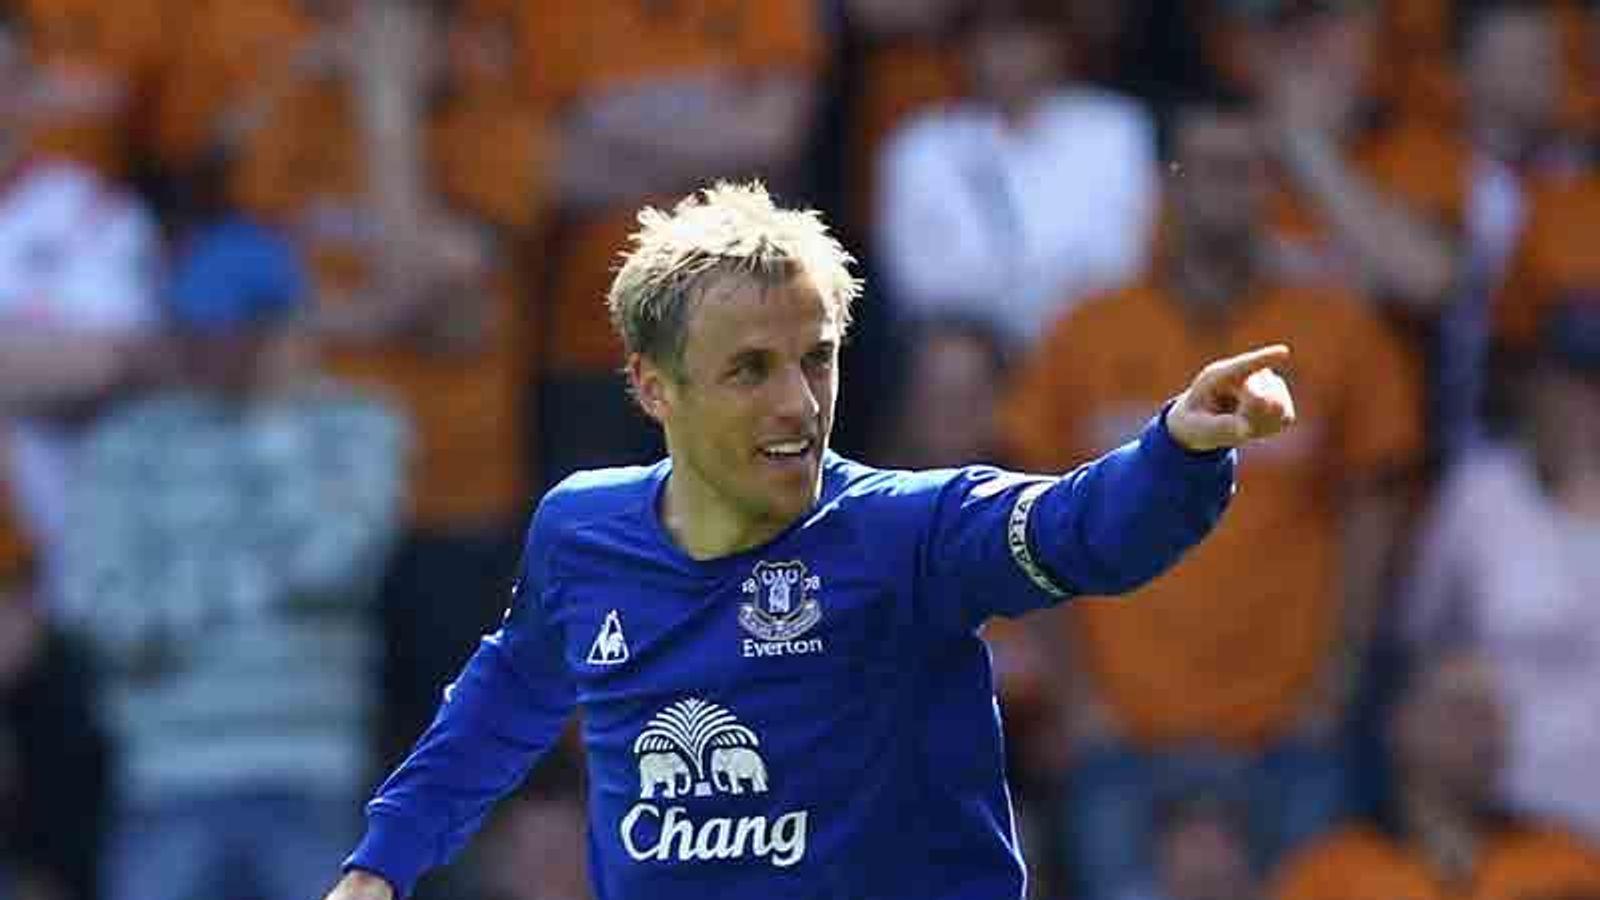 Wolves 0 - 3 Everton - Match Report & Highlights